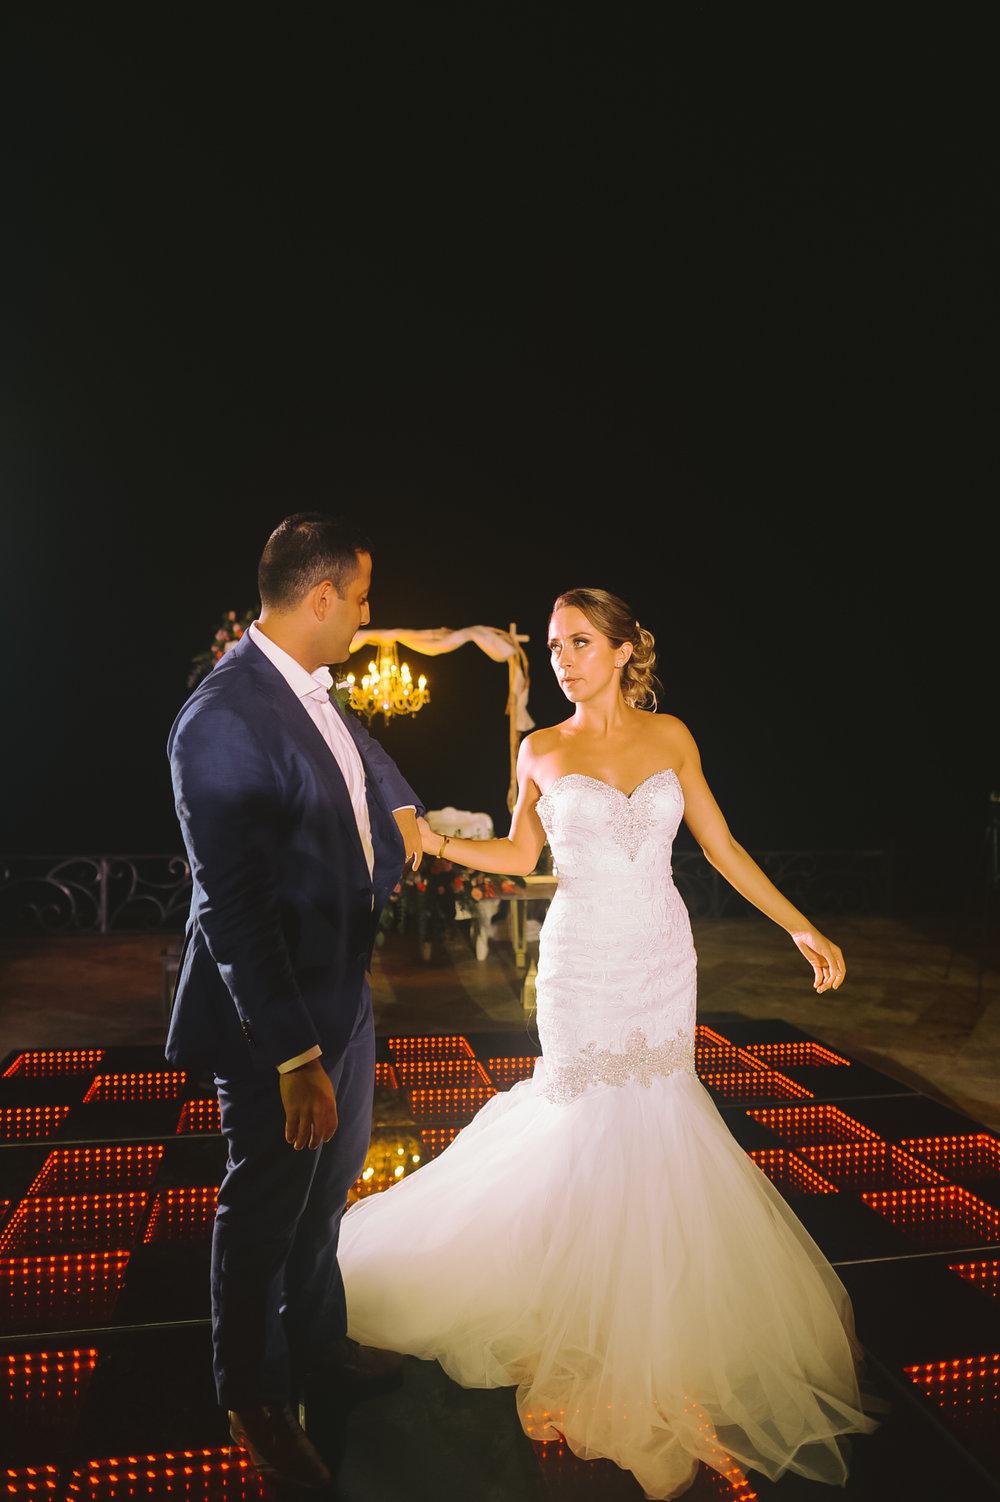 cancun_wedding_venue_mexico_24.jpg